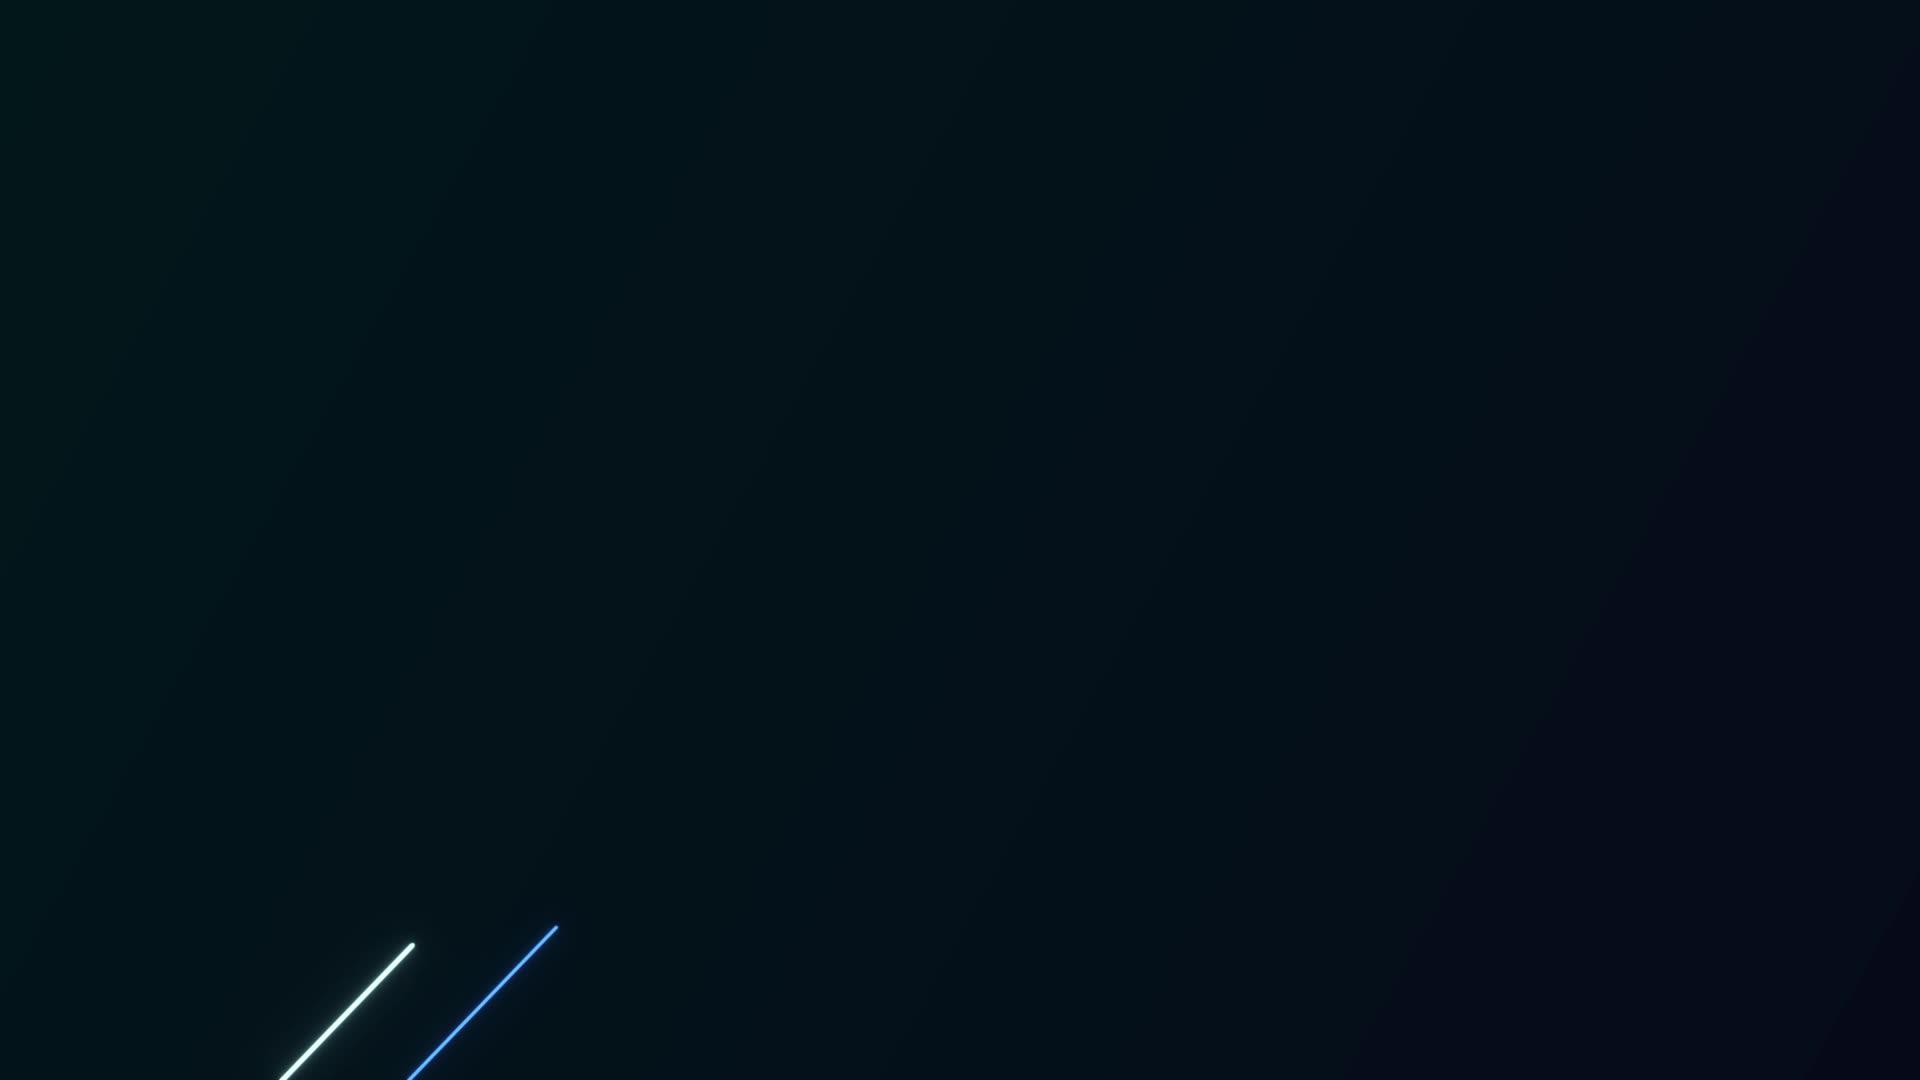 Oneodio 헤드폰 Hifi 스튜디오 DJ 헤드폰 모니터 음악 게임 헤드셋 이어폰 컴퓨터 PC 마이크